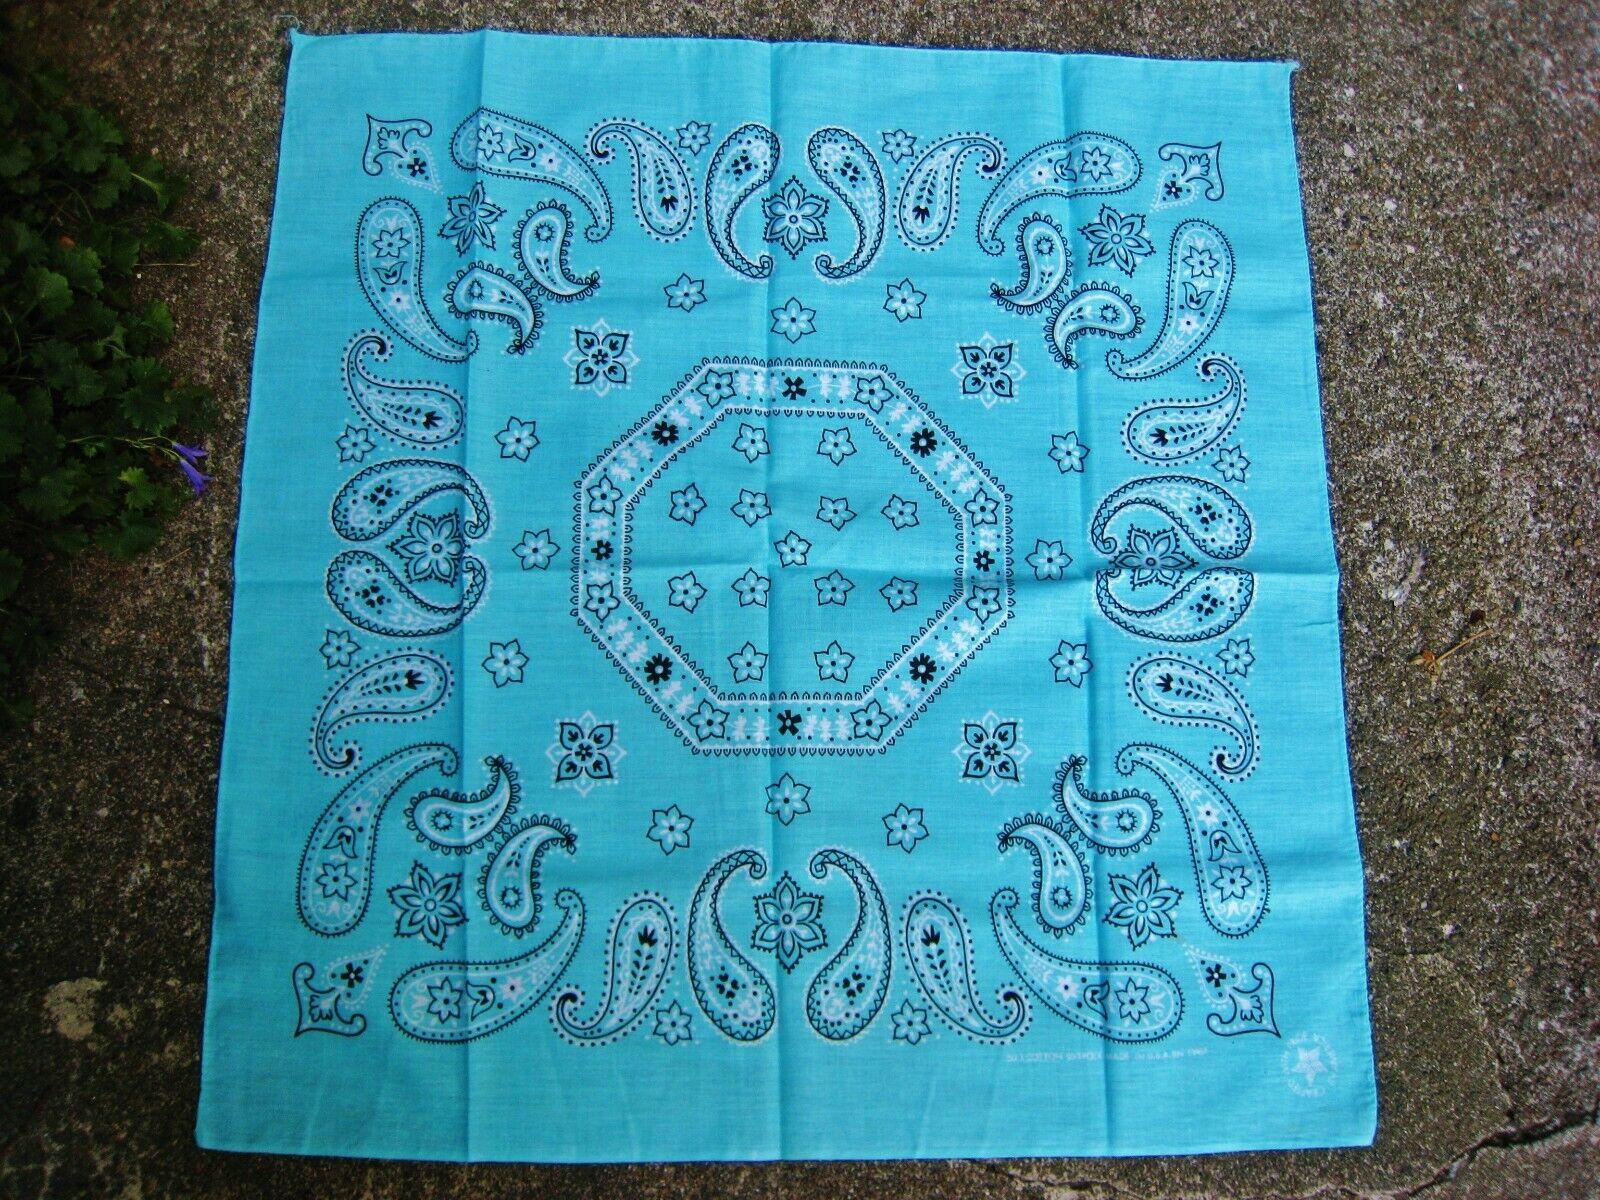 Bandana amÉricain foulard vintage bleu des mers du sud motif paisley 56 cmx53 cm